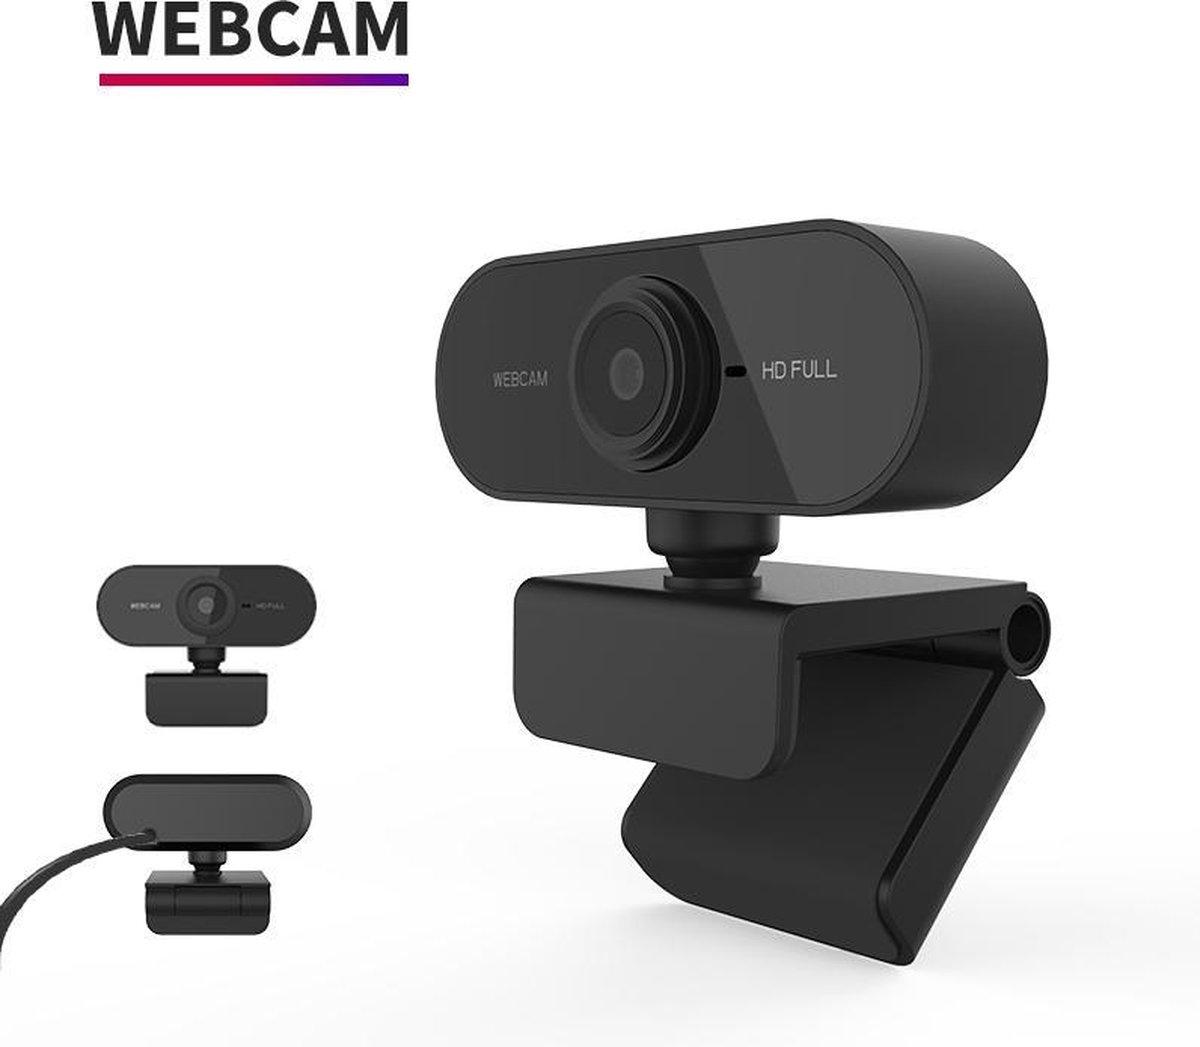 Webcam full HD (1080p) - Met ingebouwde microfoon - USB Webcam voor PC